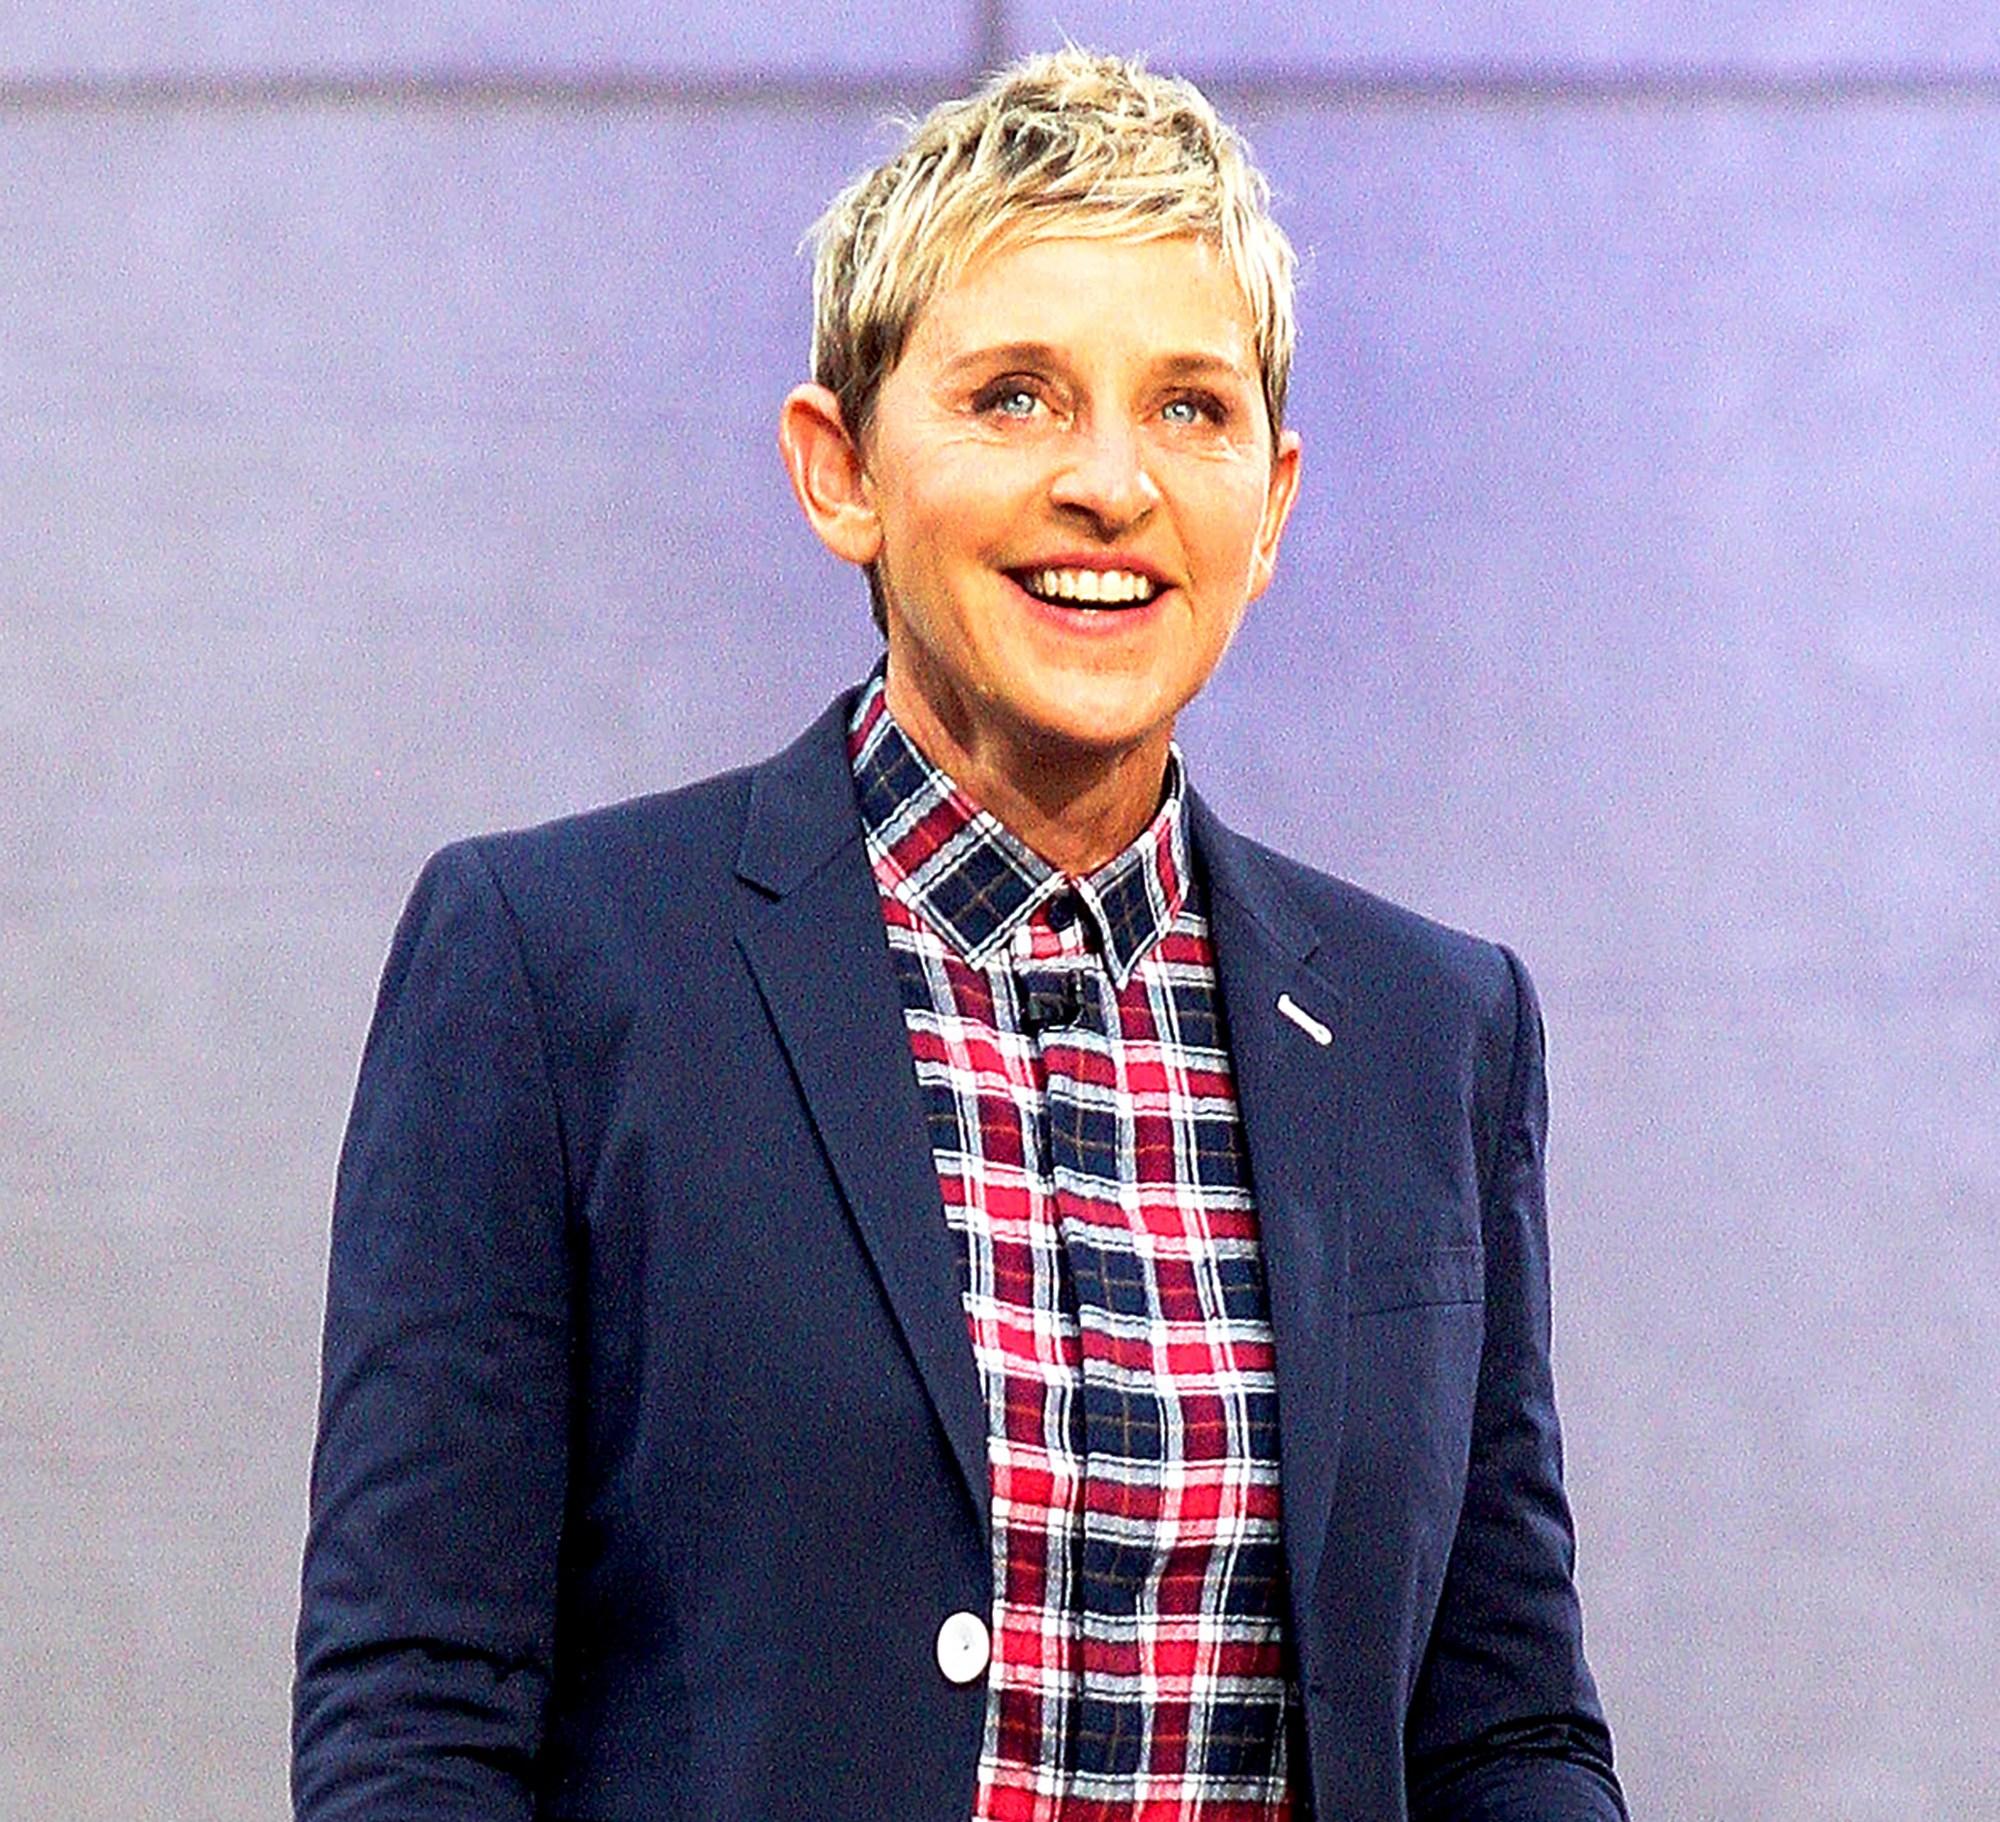 Ellen DeGeneres attends 'The Ellen DeGeneres Show' Bi-Coastal Premiere at Rockefeller Center in New York City.